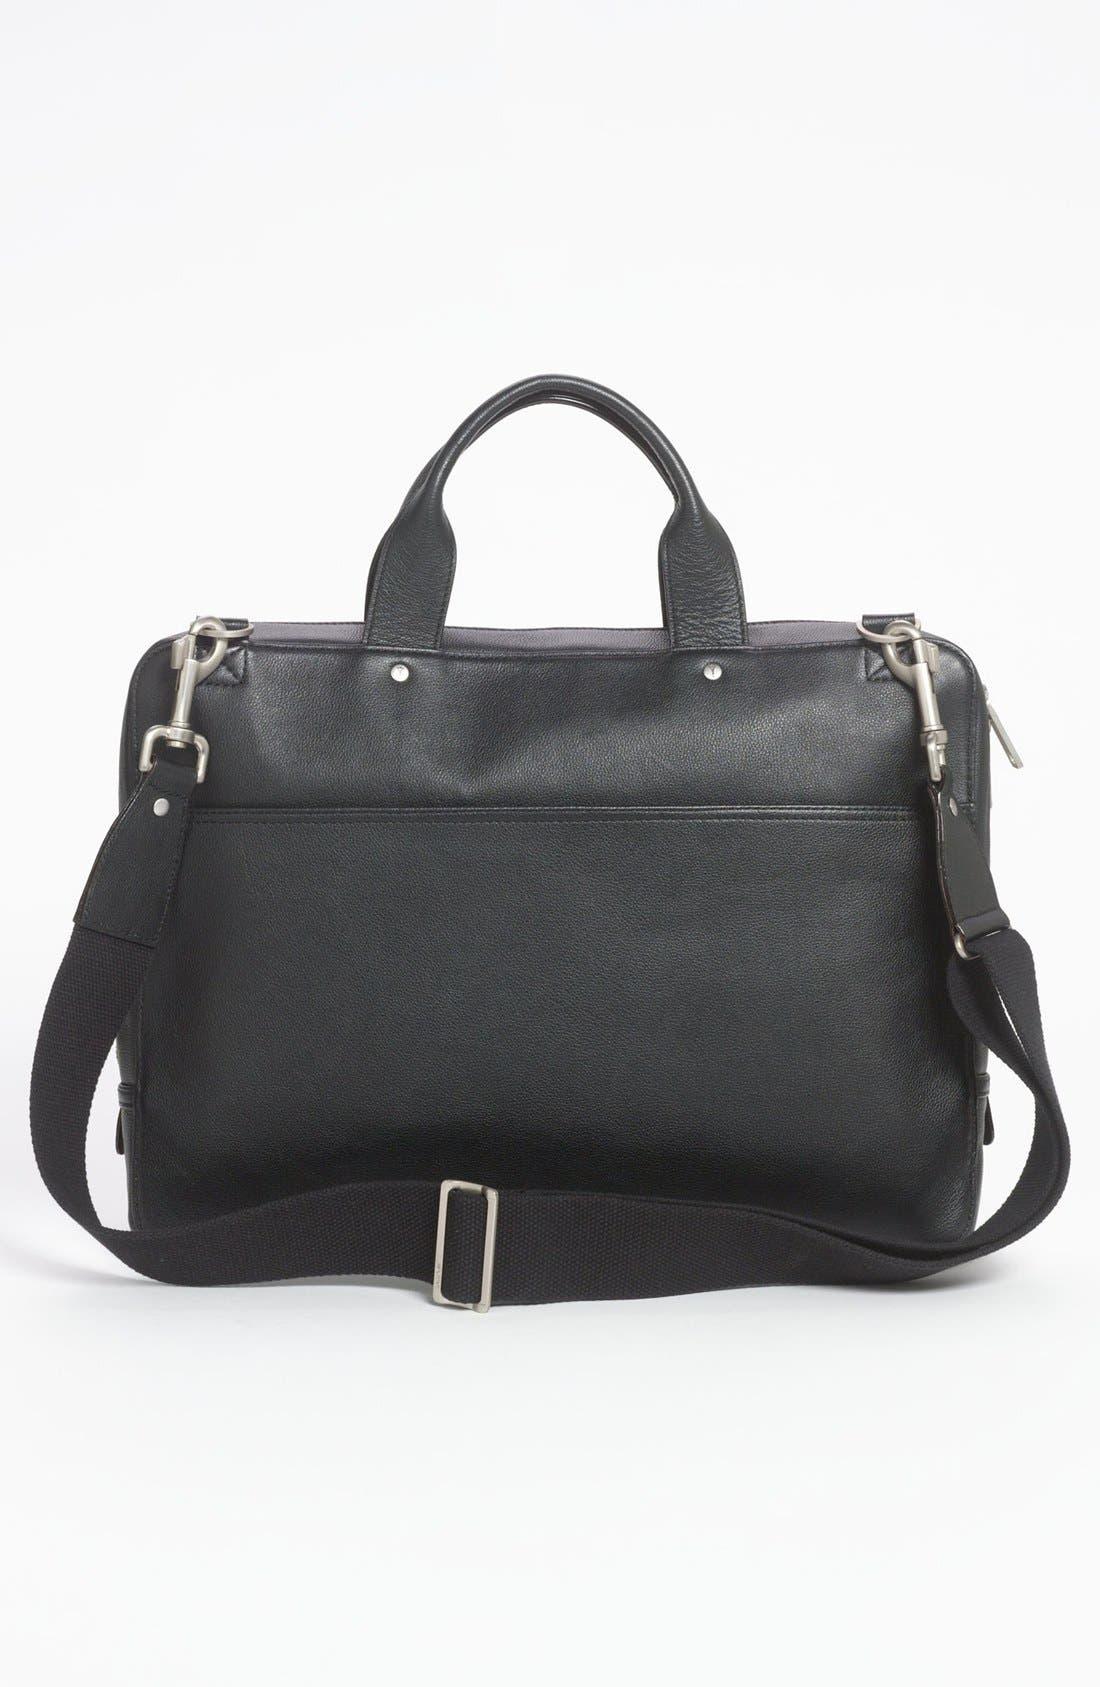 JACK SPADE, Slim Leather Briefcase, Alternate thumbnail 4, color, 001